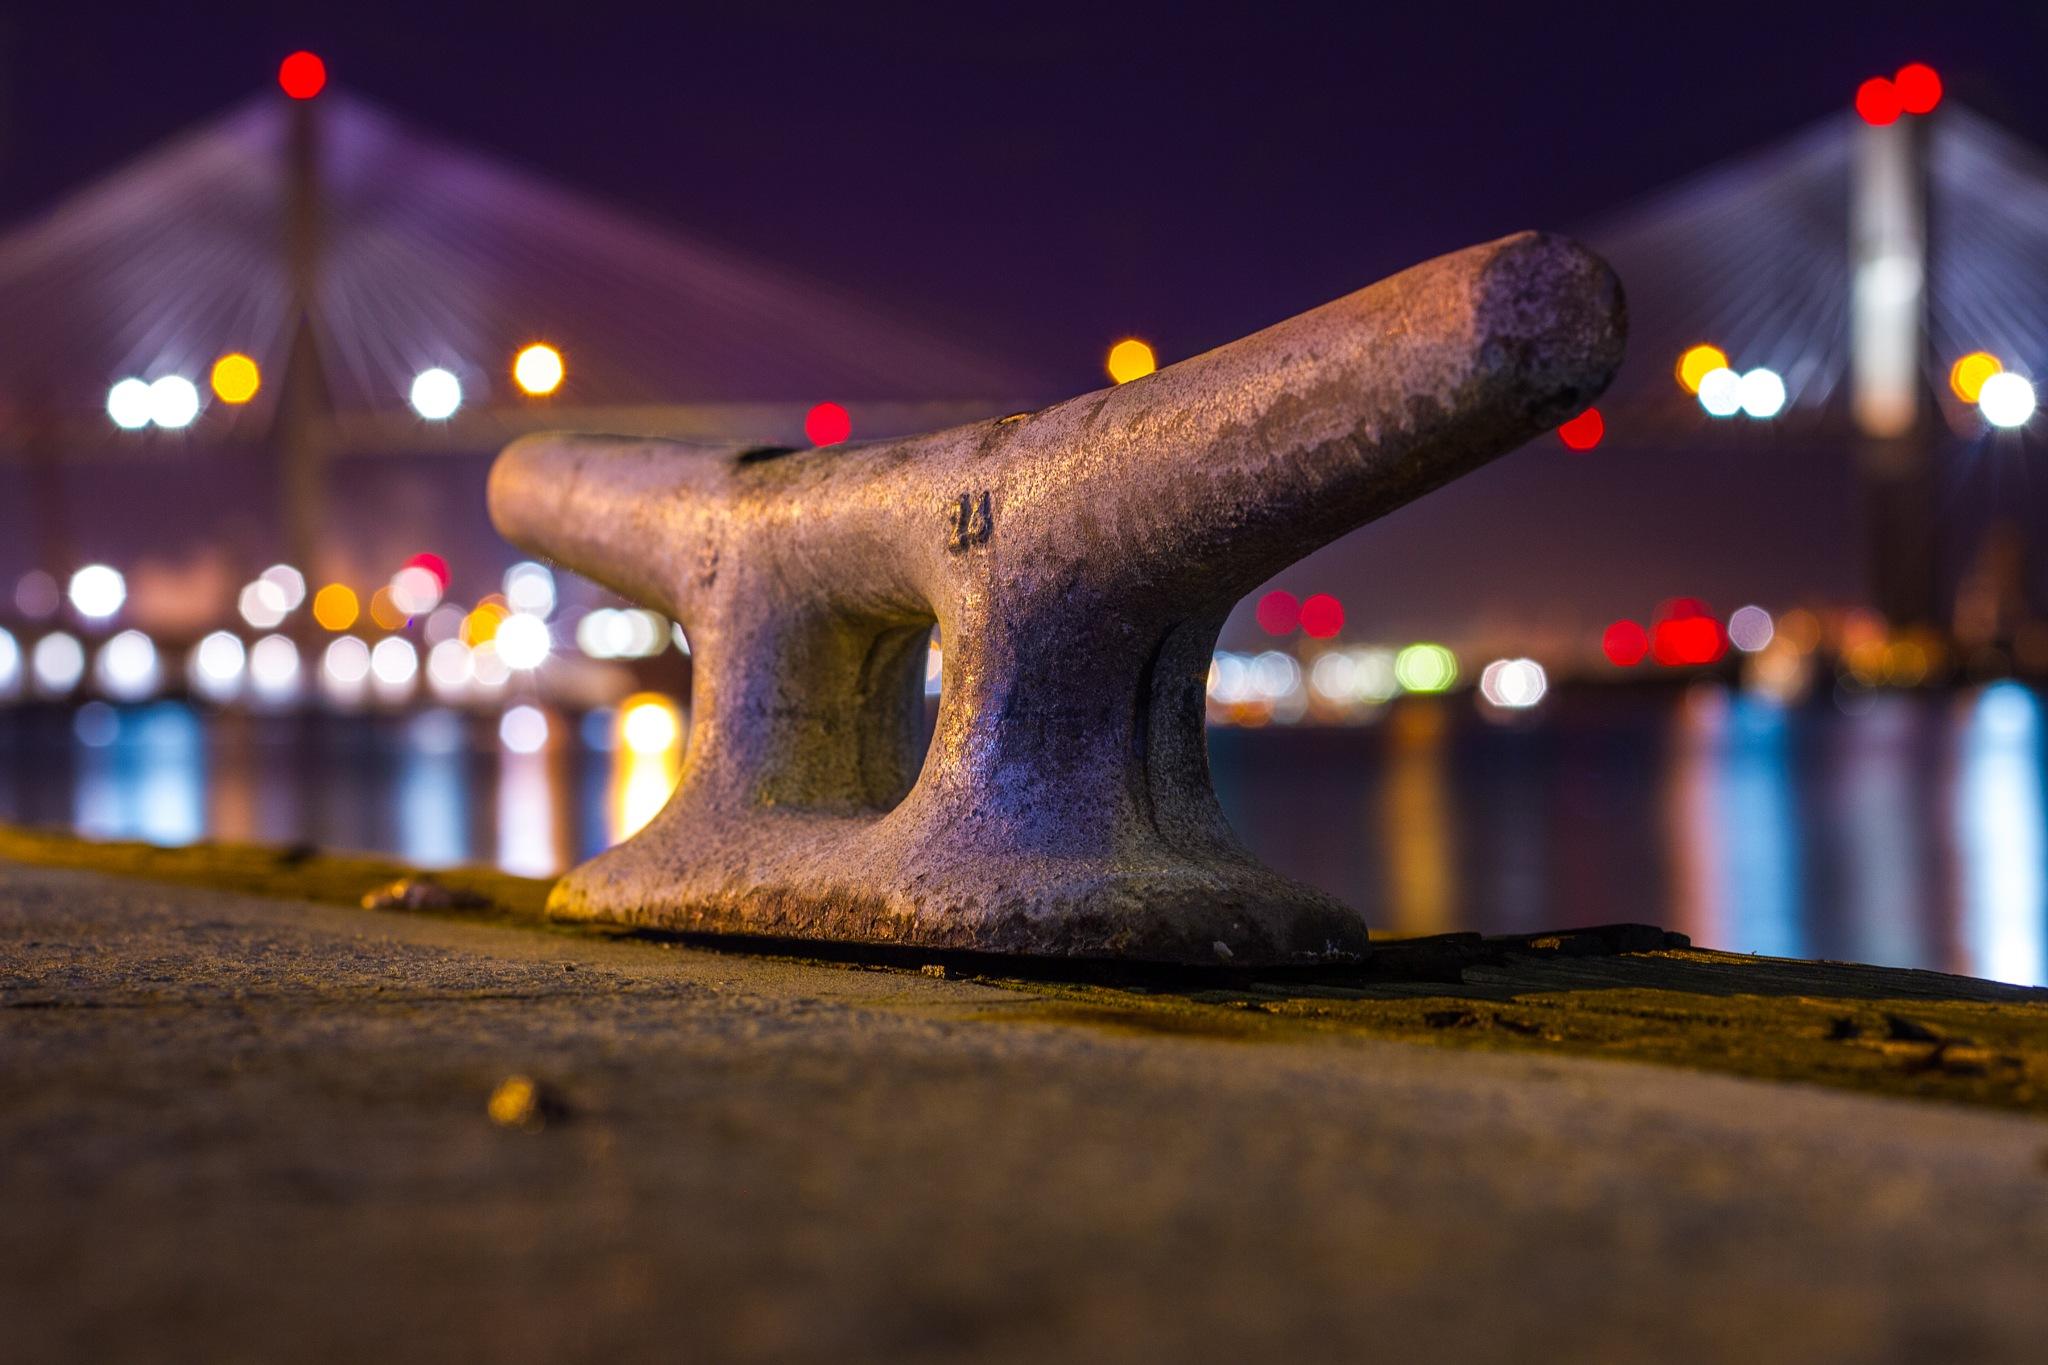 Savannah Docks at Night  by Tyler Dewland